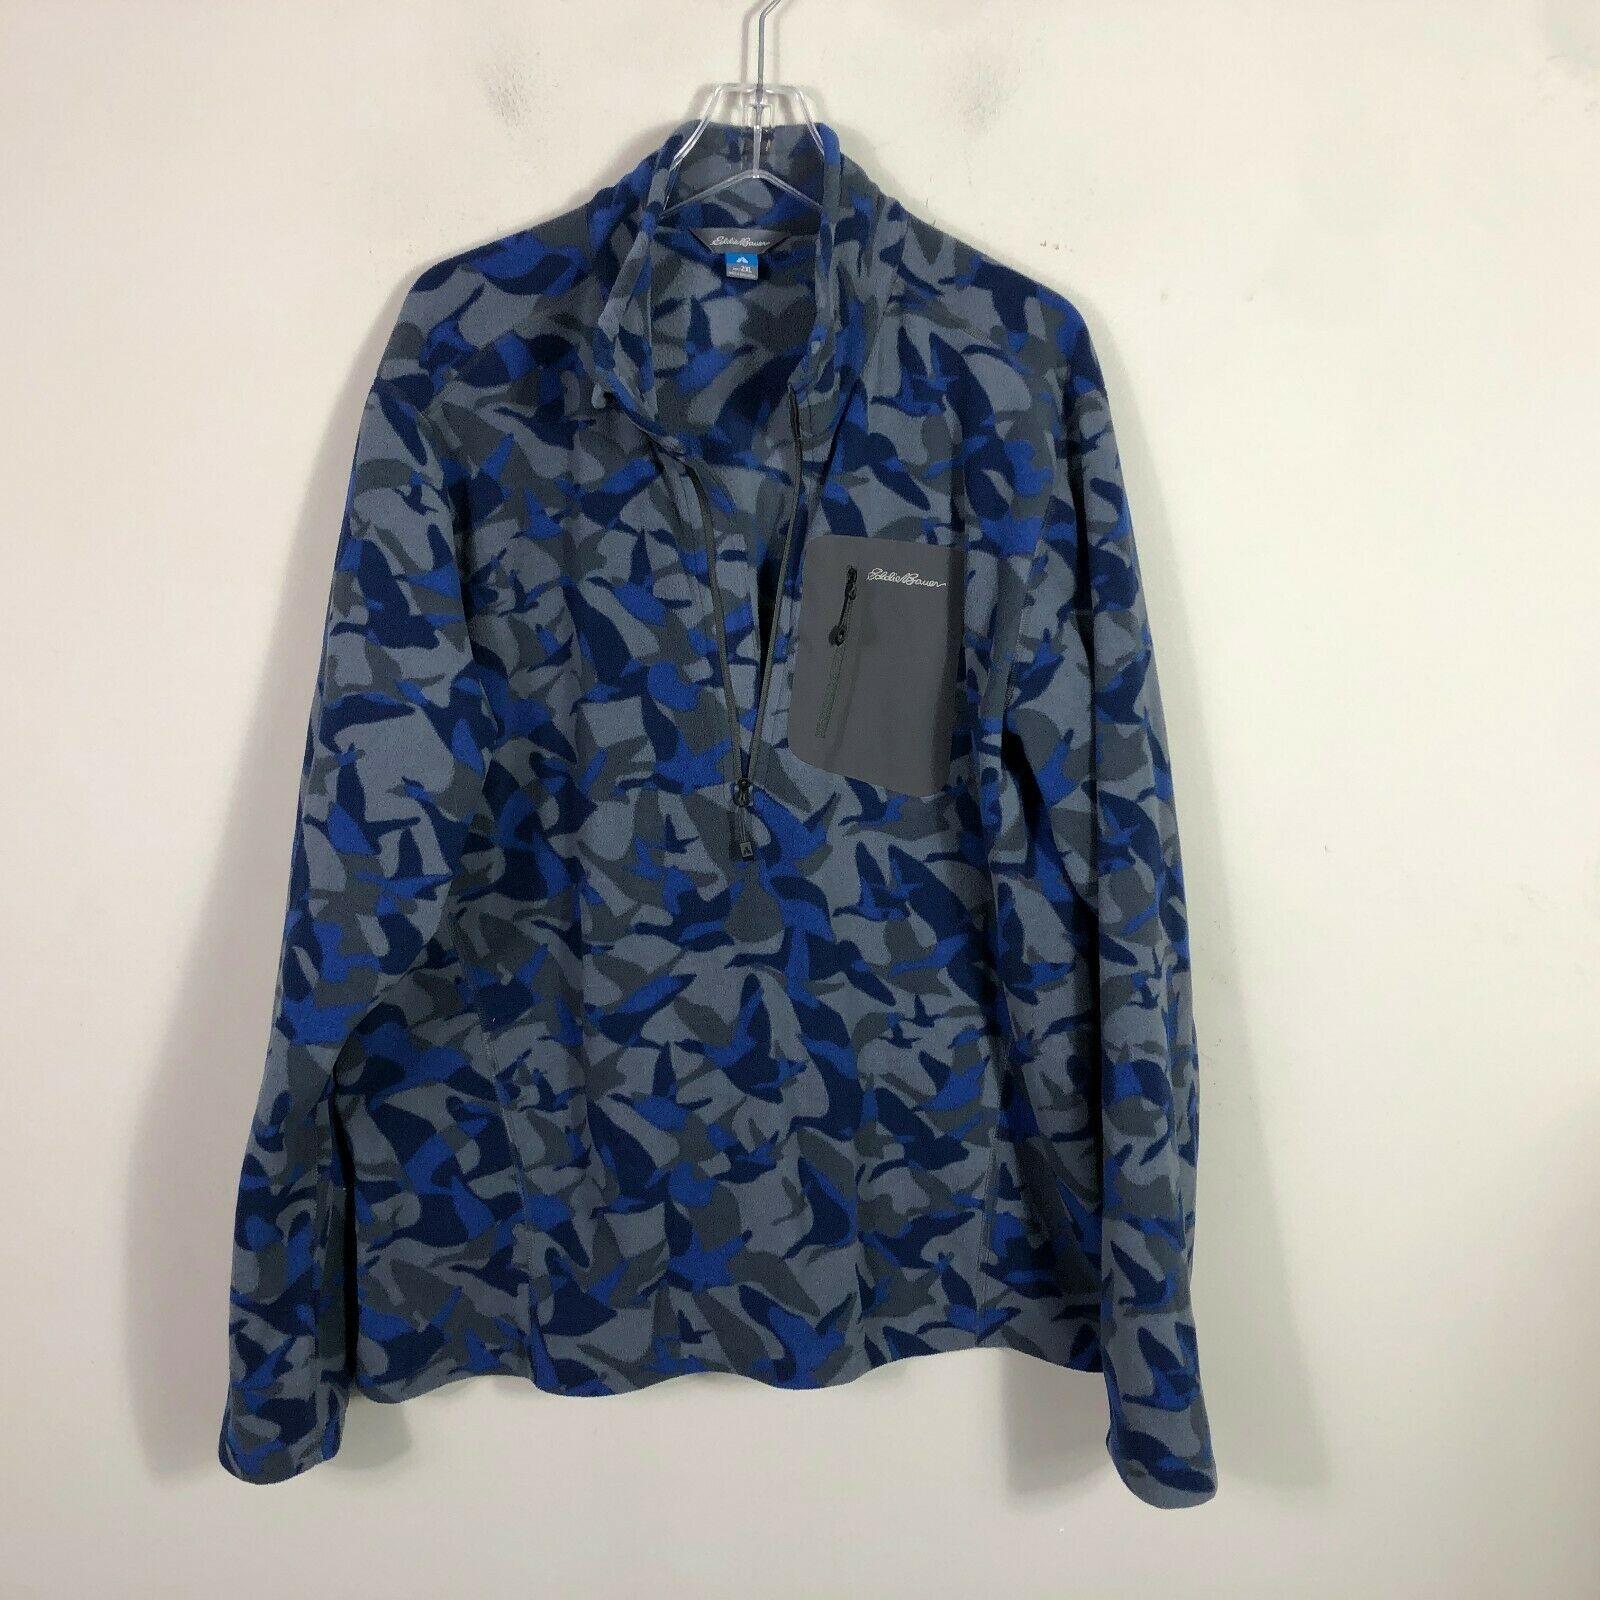 Eddie Bauer First Ascent Fleece Jacket 1/2 Zip Men's 2XL Blue Gray Long Sleeve image 10